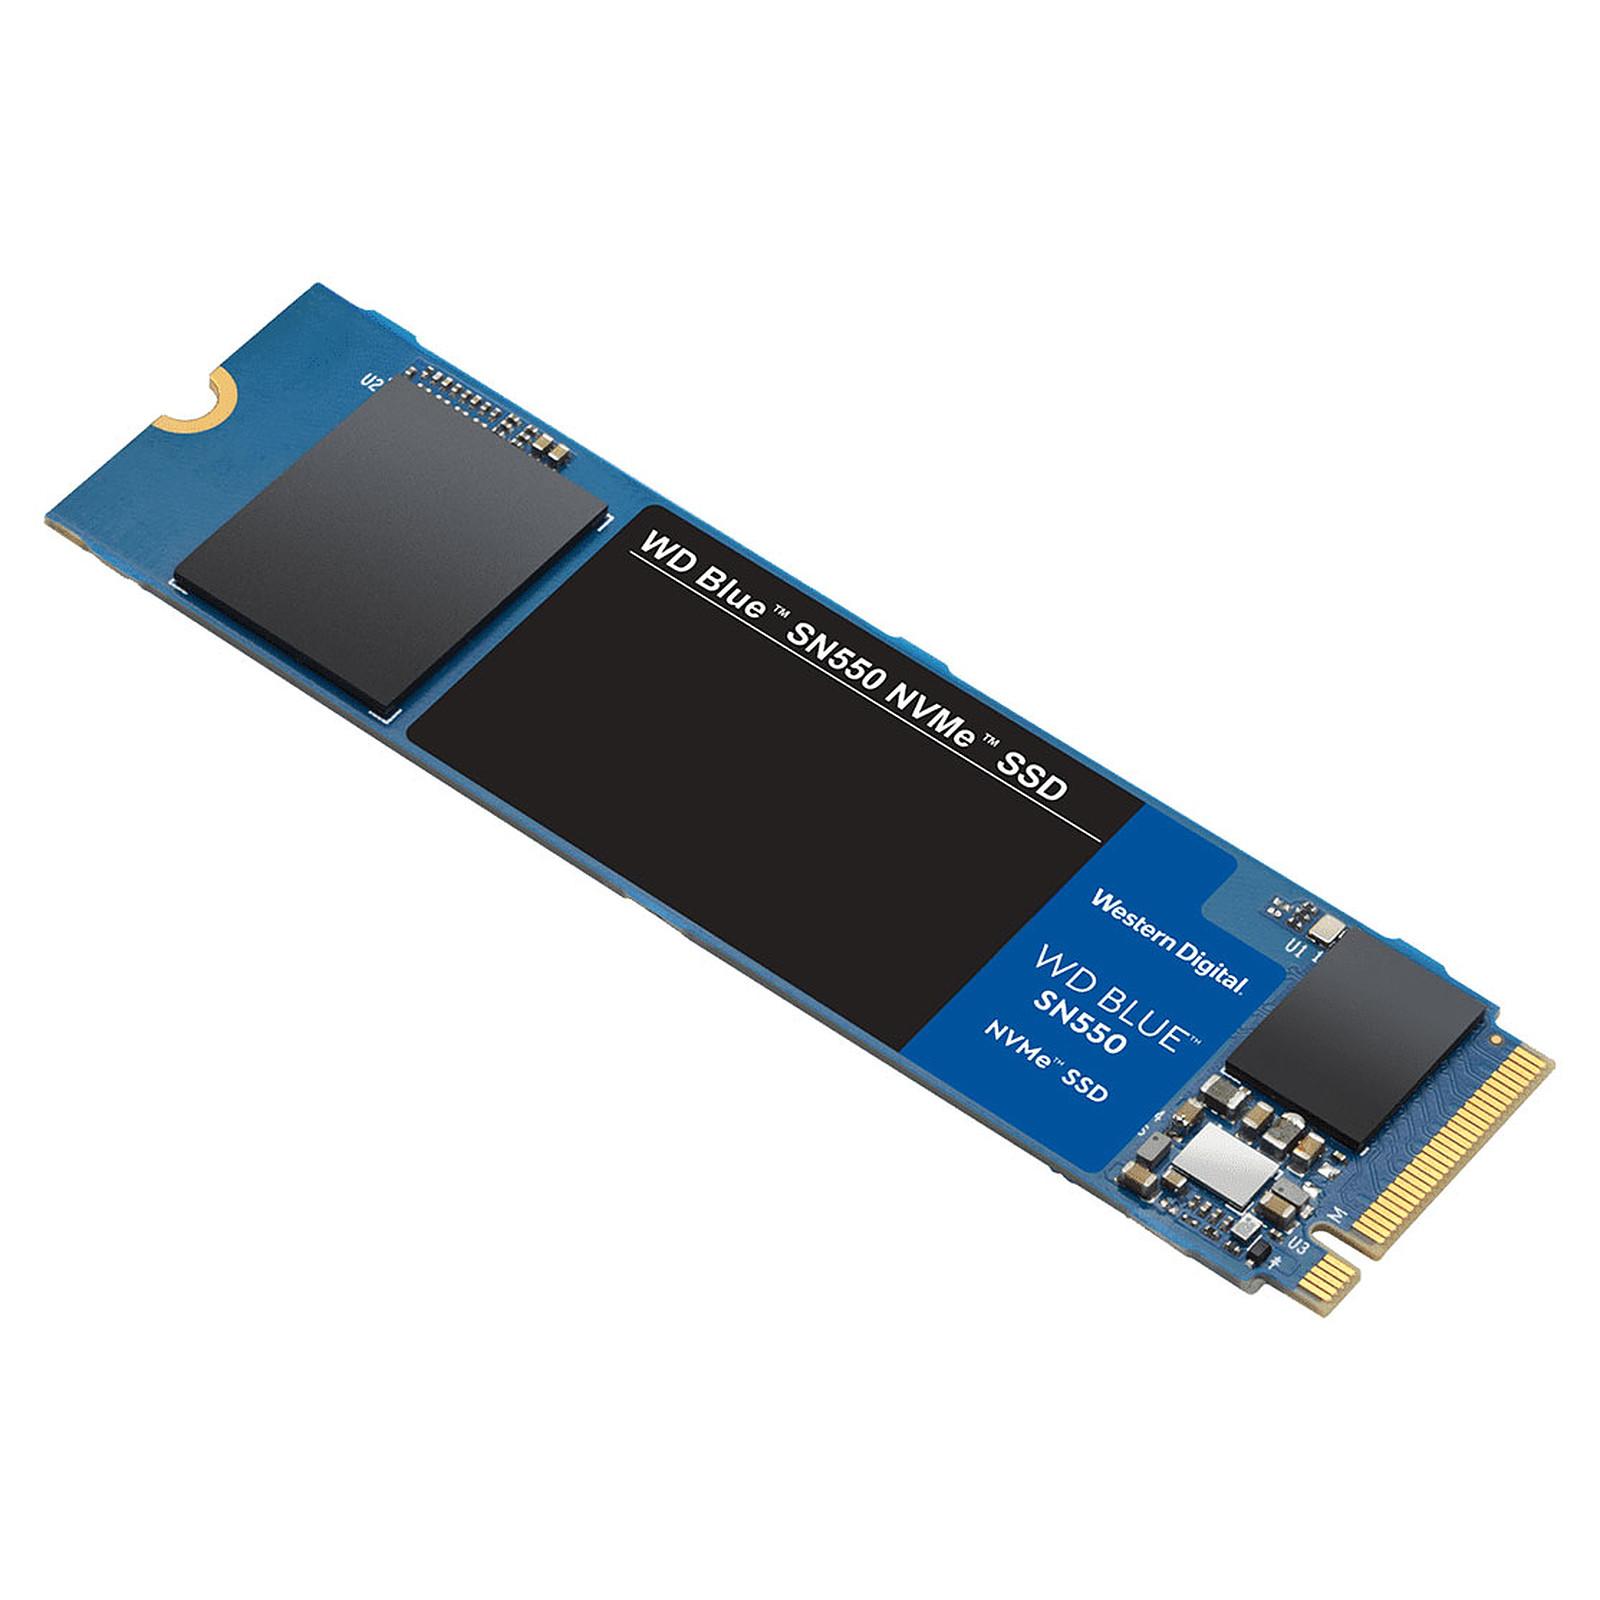 WD WDS500G2B0C 480-525Go M.2 - Disque SSD WD - Cybertek.fr - 2